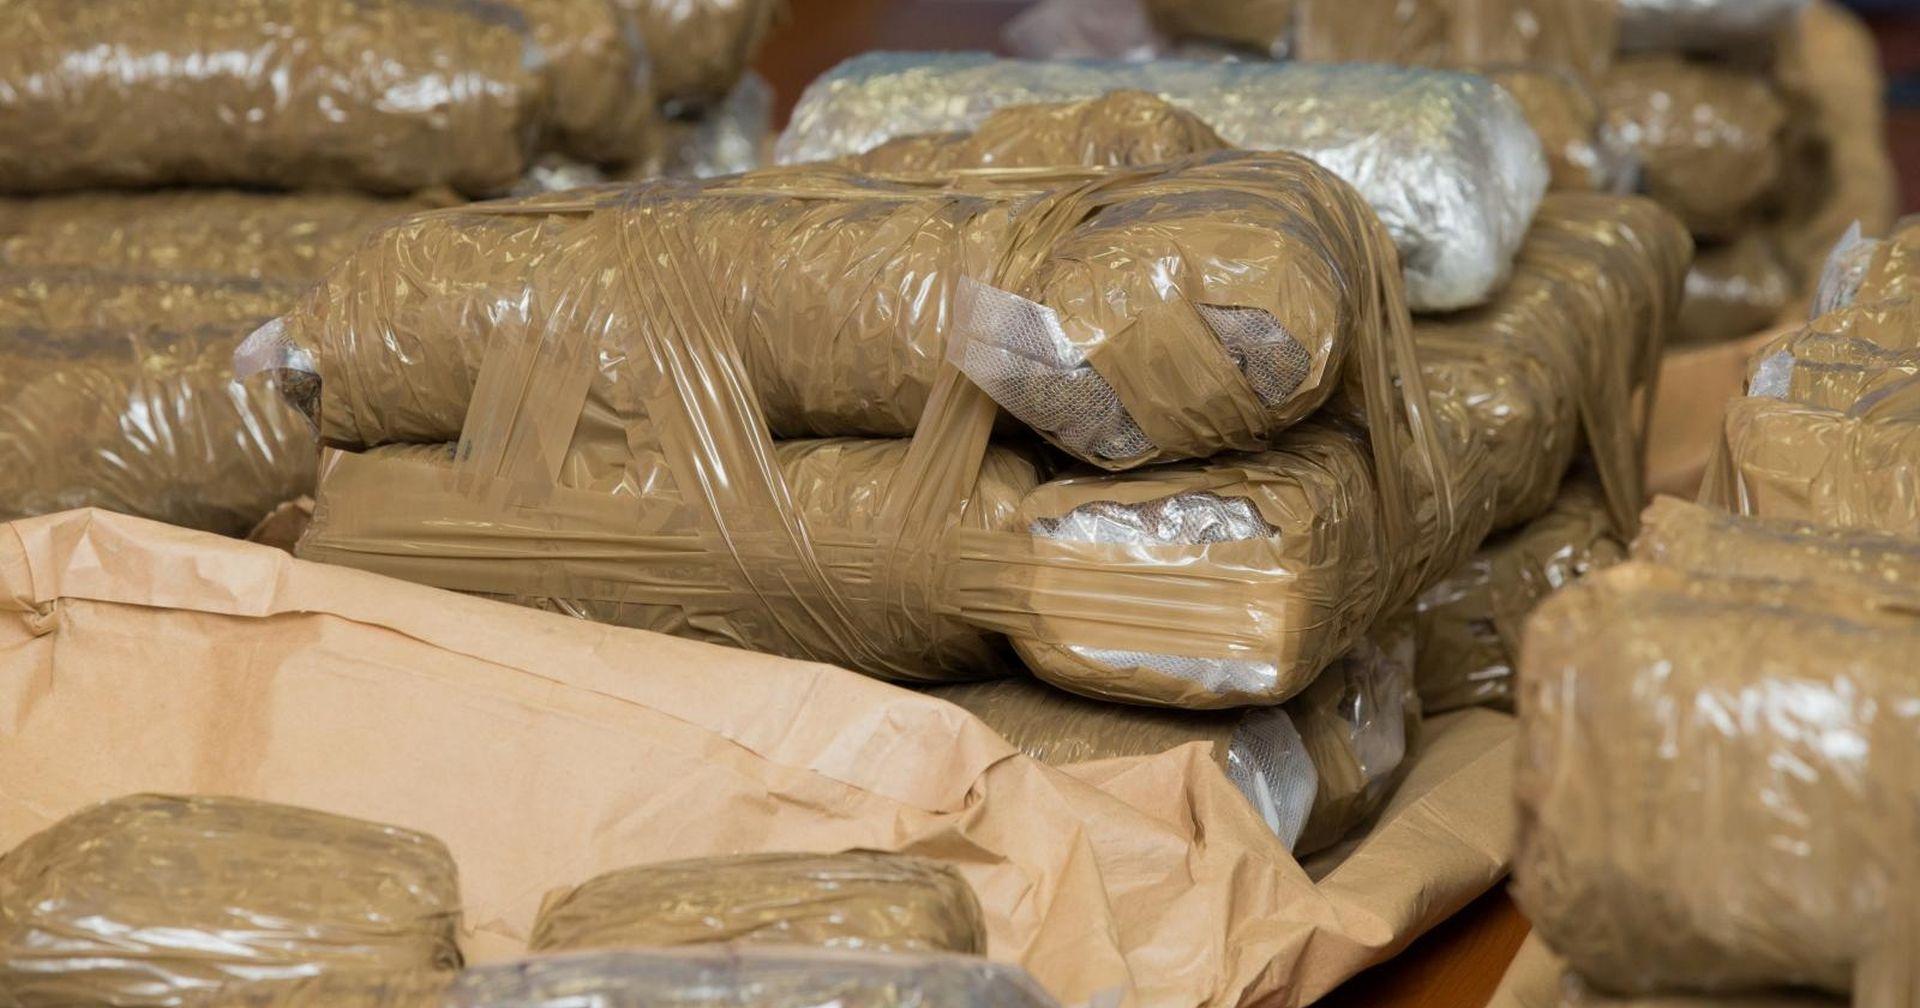 SPLIT U automobilu skrivali 3,4 kilograma marihuane